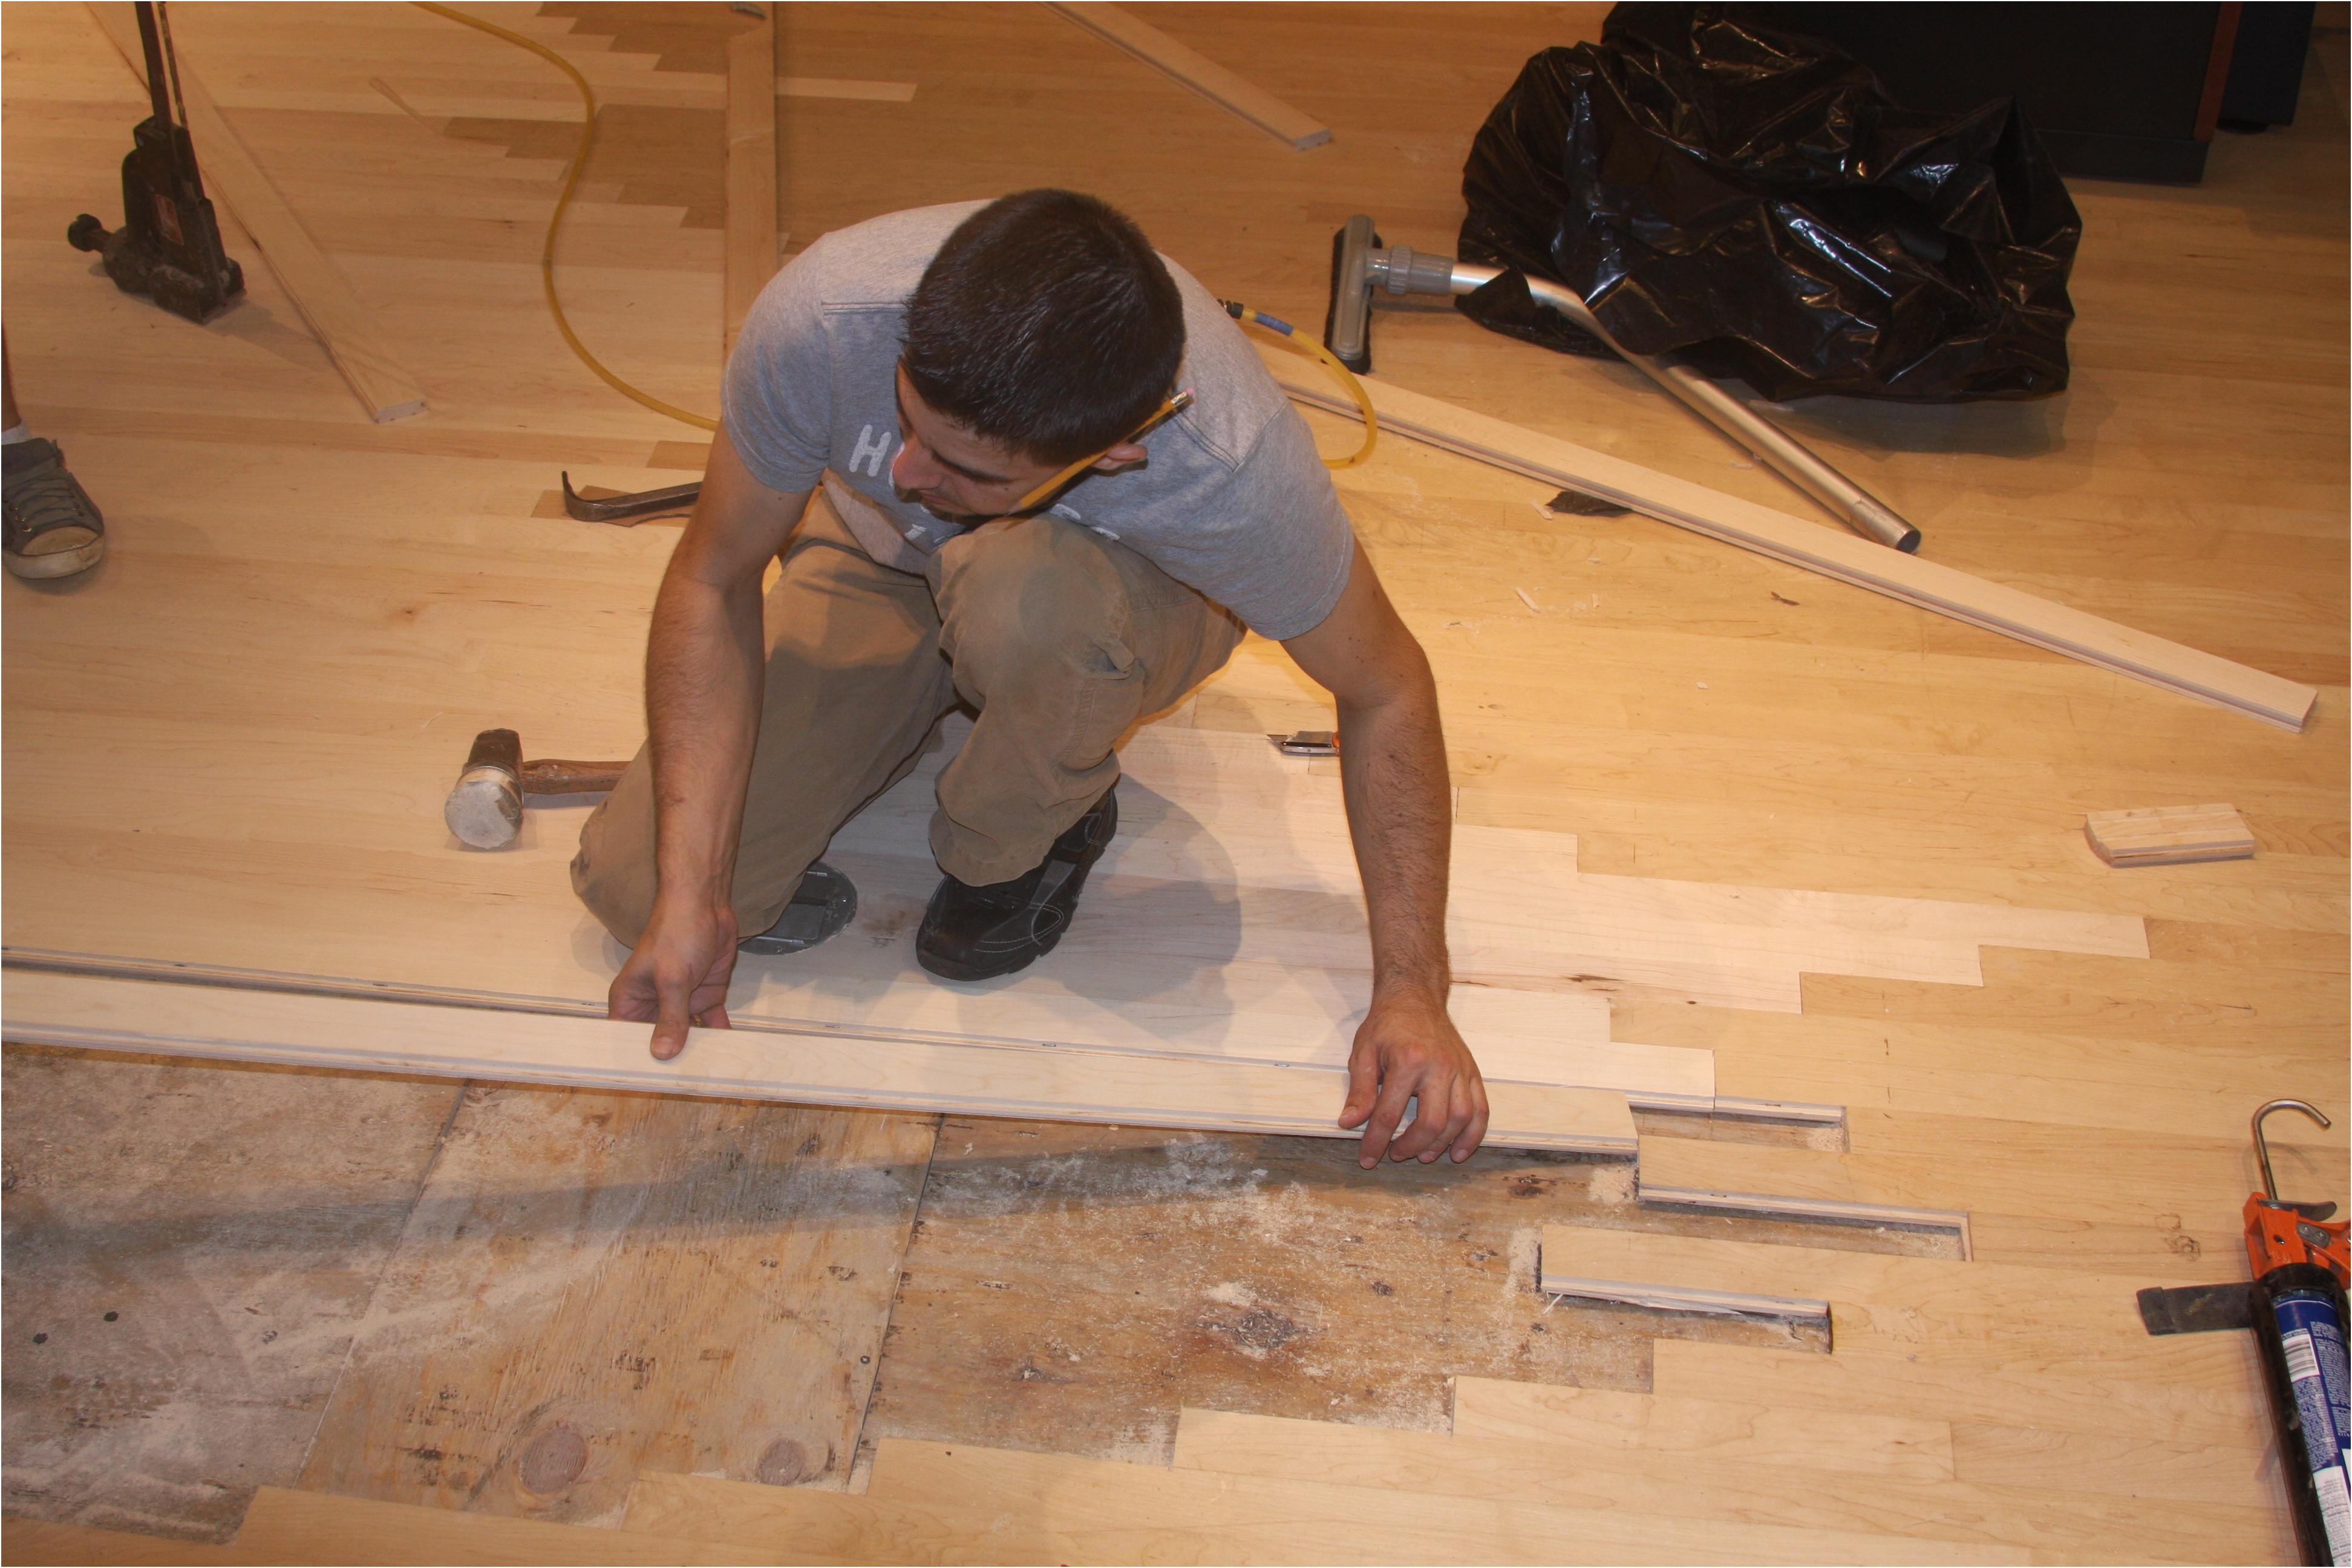 installing glue down hardwood floors on concrete of best way to install engineered wood flooring over concrete how to intended for best way to install engineered wood flooring over concrete how to lay hardwood flooring a concrete